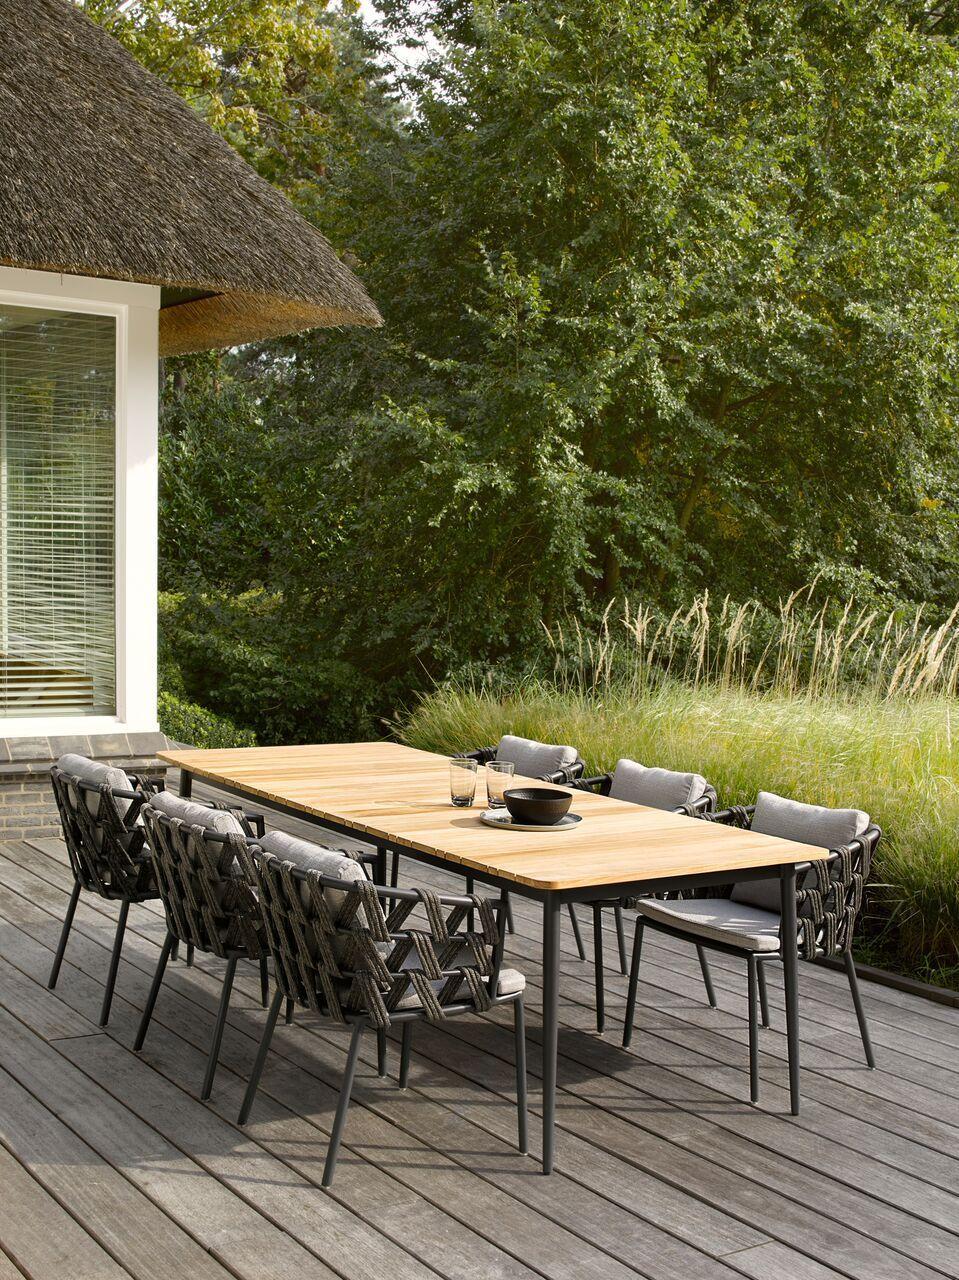 table-de-jardin-en-teck_6030280 -vincent sheappard